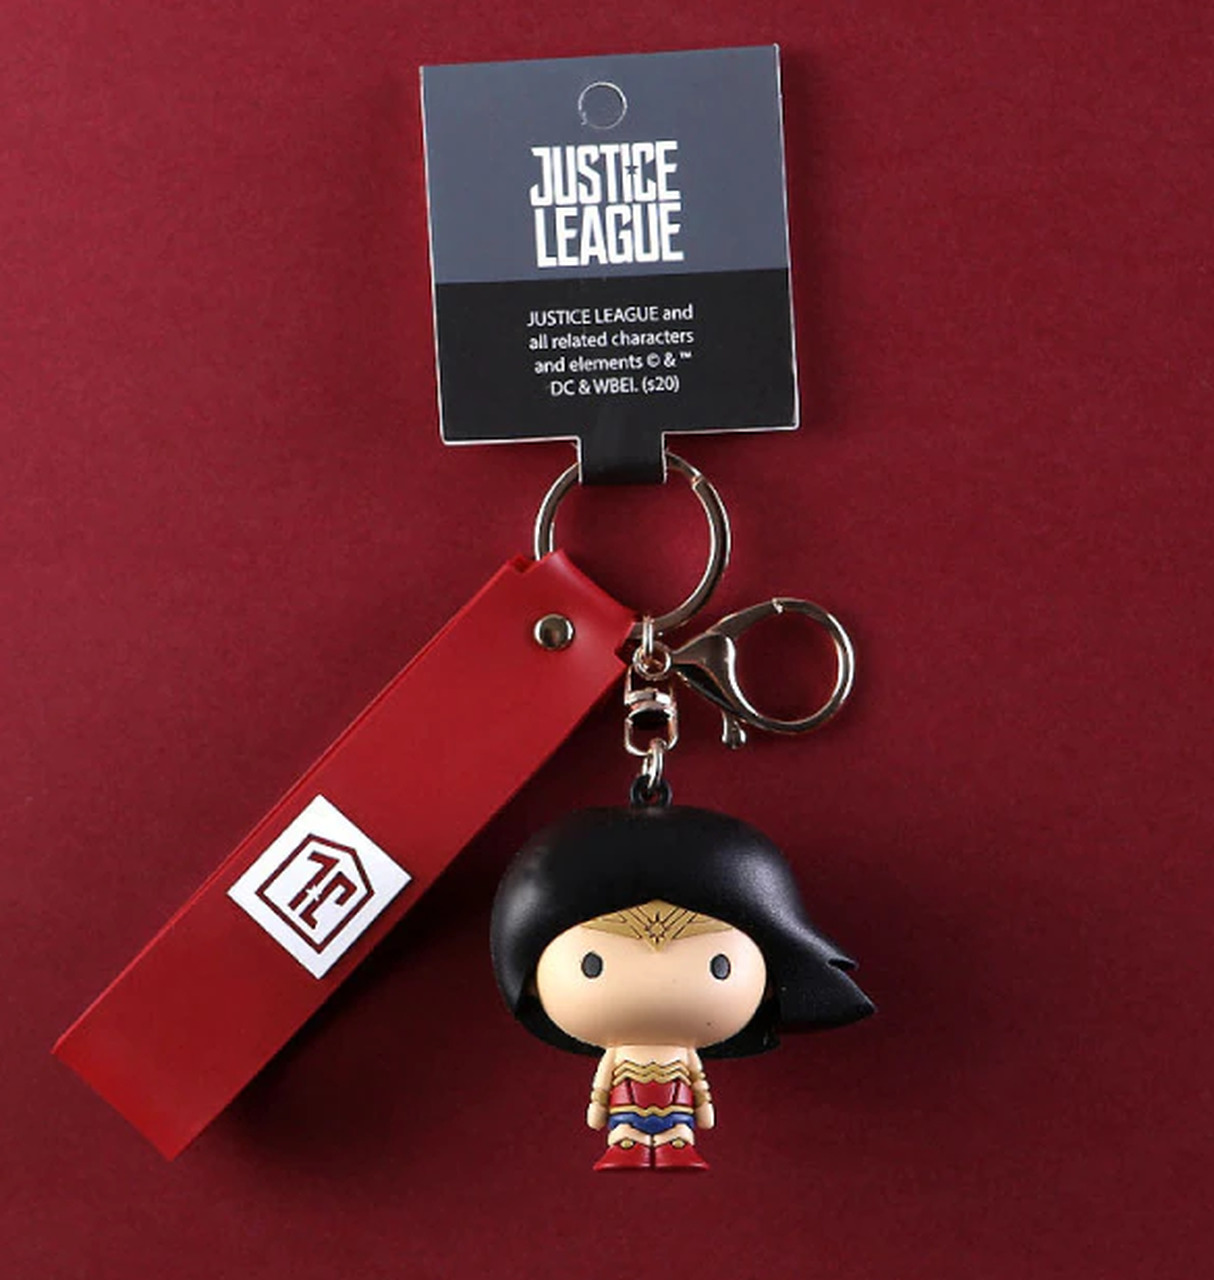 Chaveiro Mulher Maravilha Wonder Woman: Liga da Justiça Justice League DC Comics - EVALI